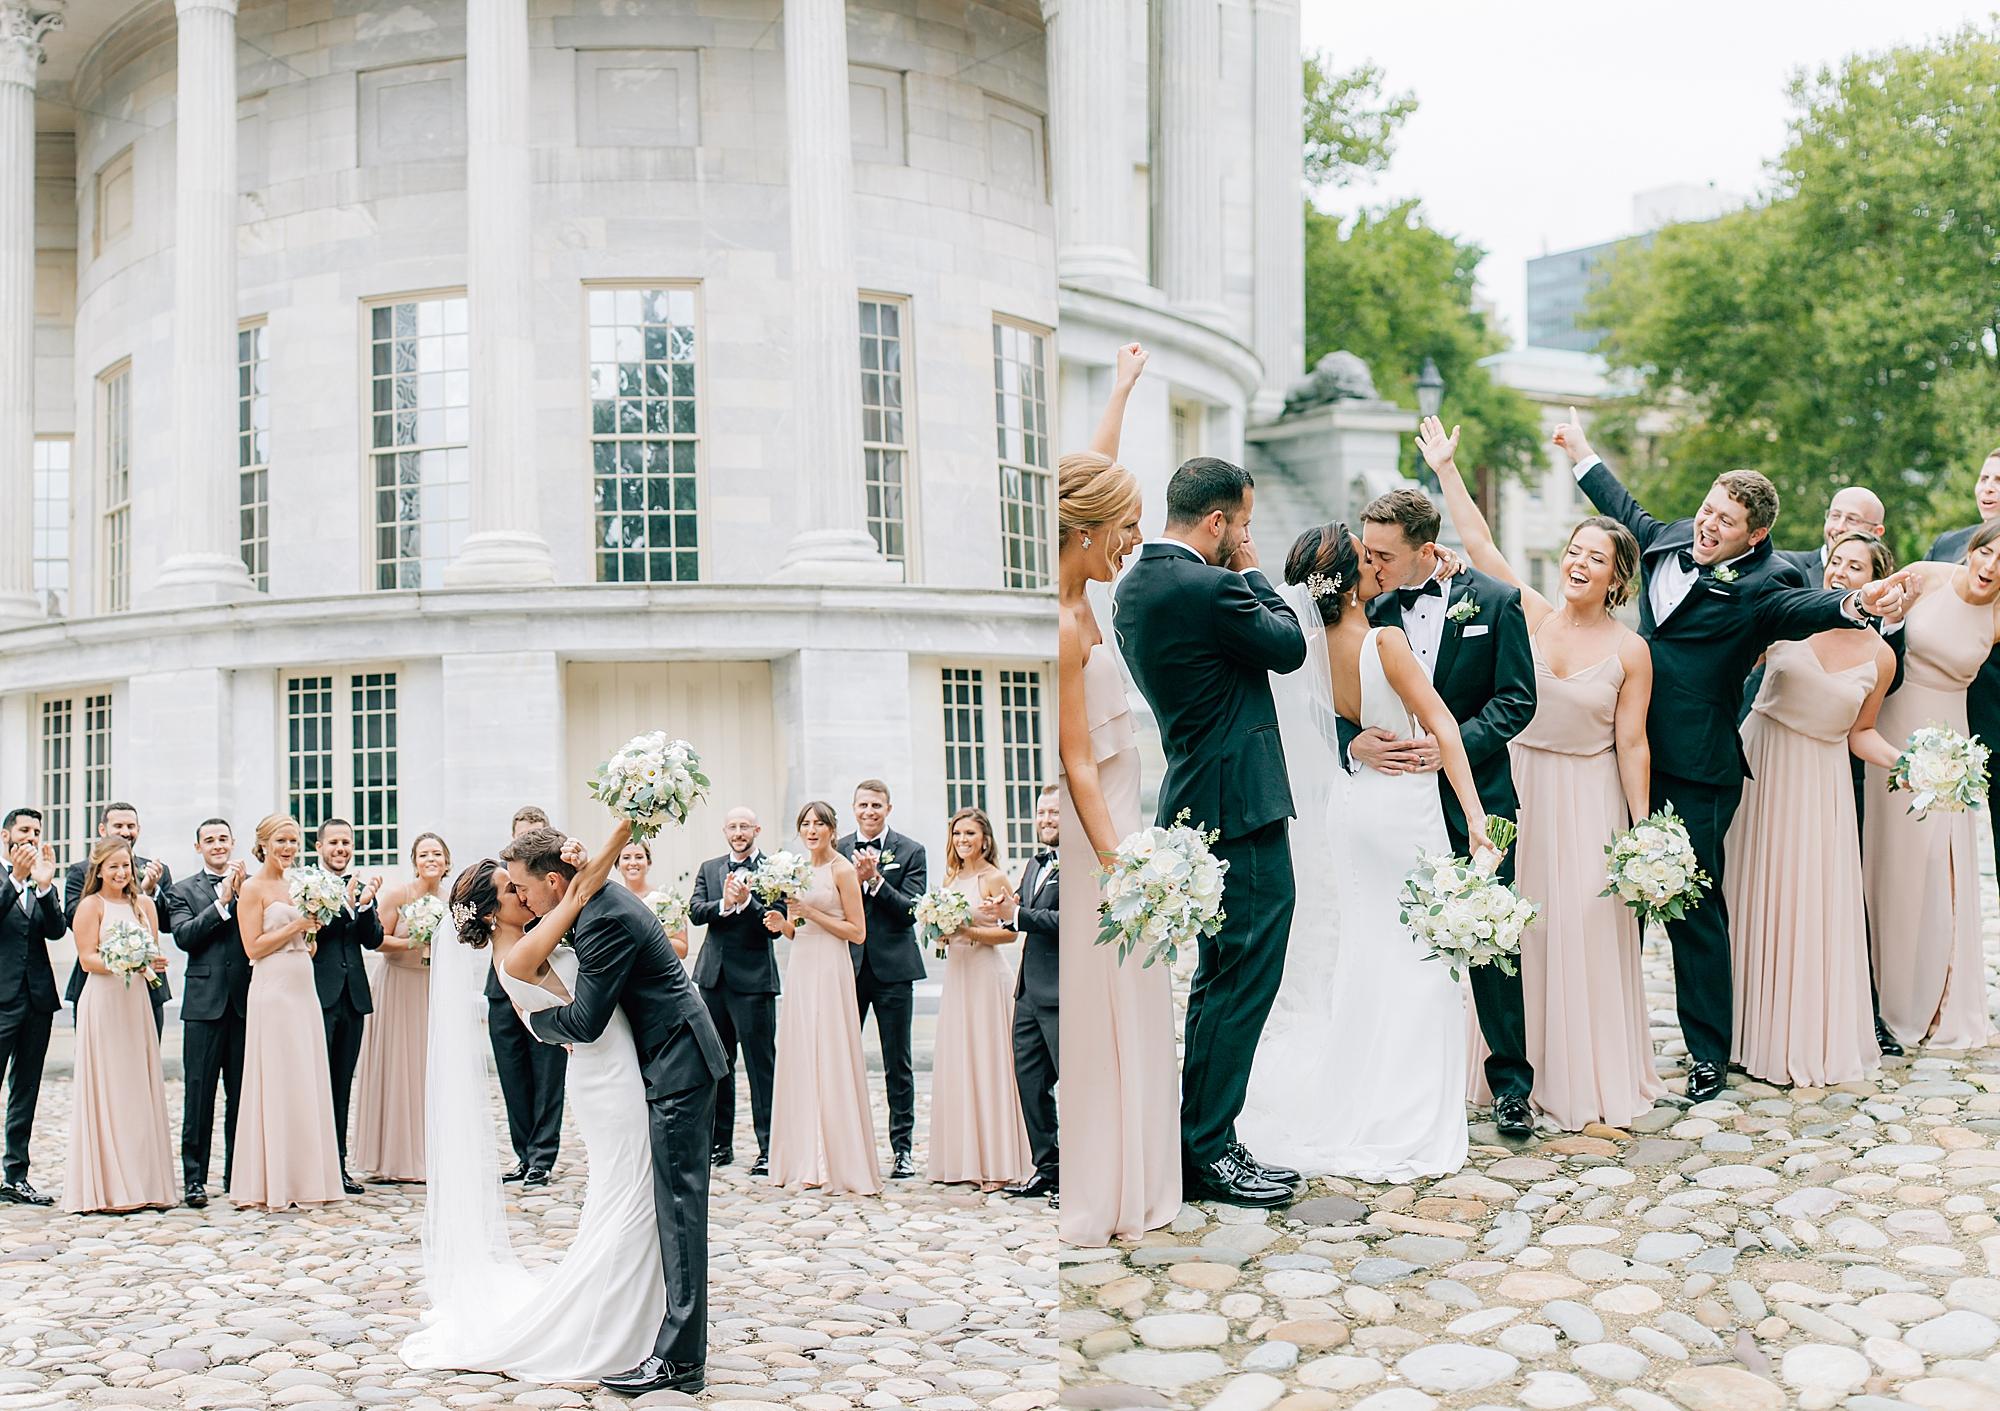 Cescaphe Philadelphia Film Wedding Photography by Magdalena Studios 24